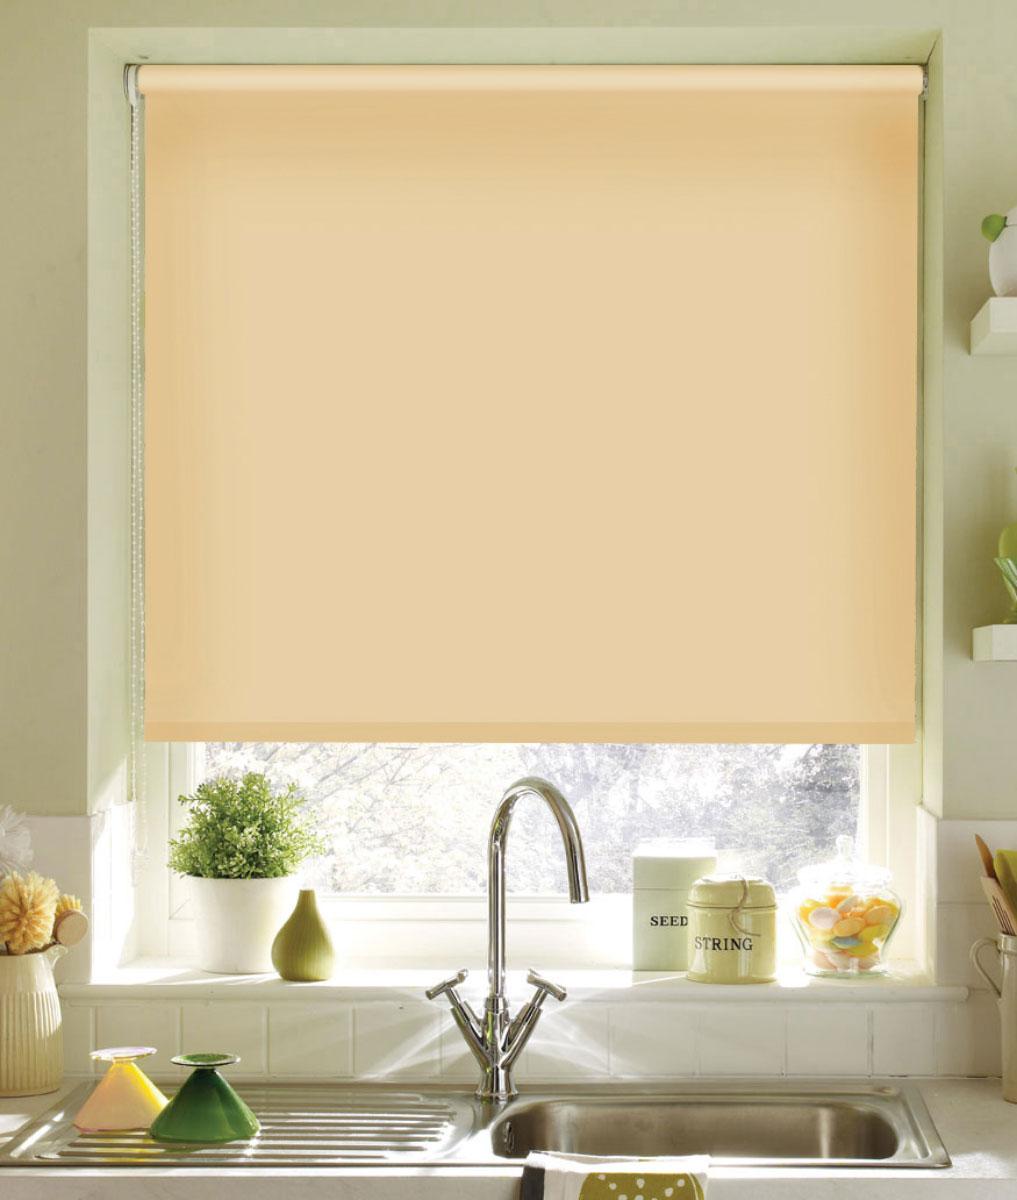 Миниролло KauffOrt 115х170 см, цвет: светлый абрикос